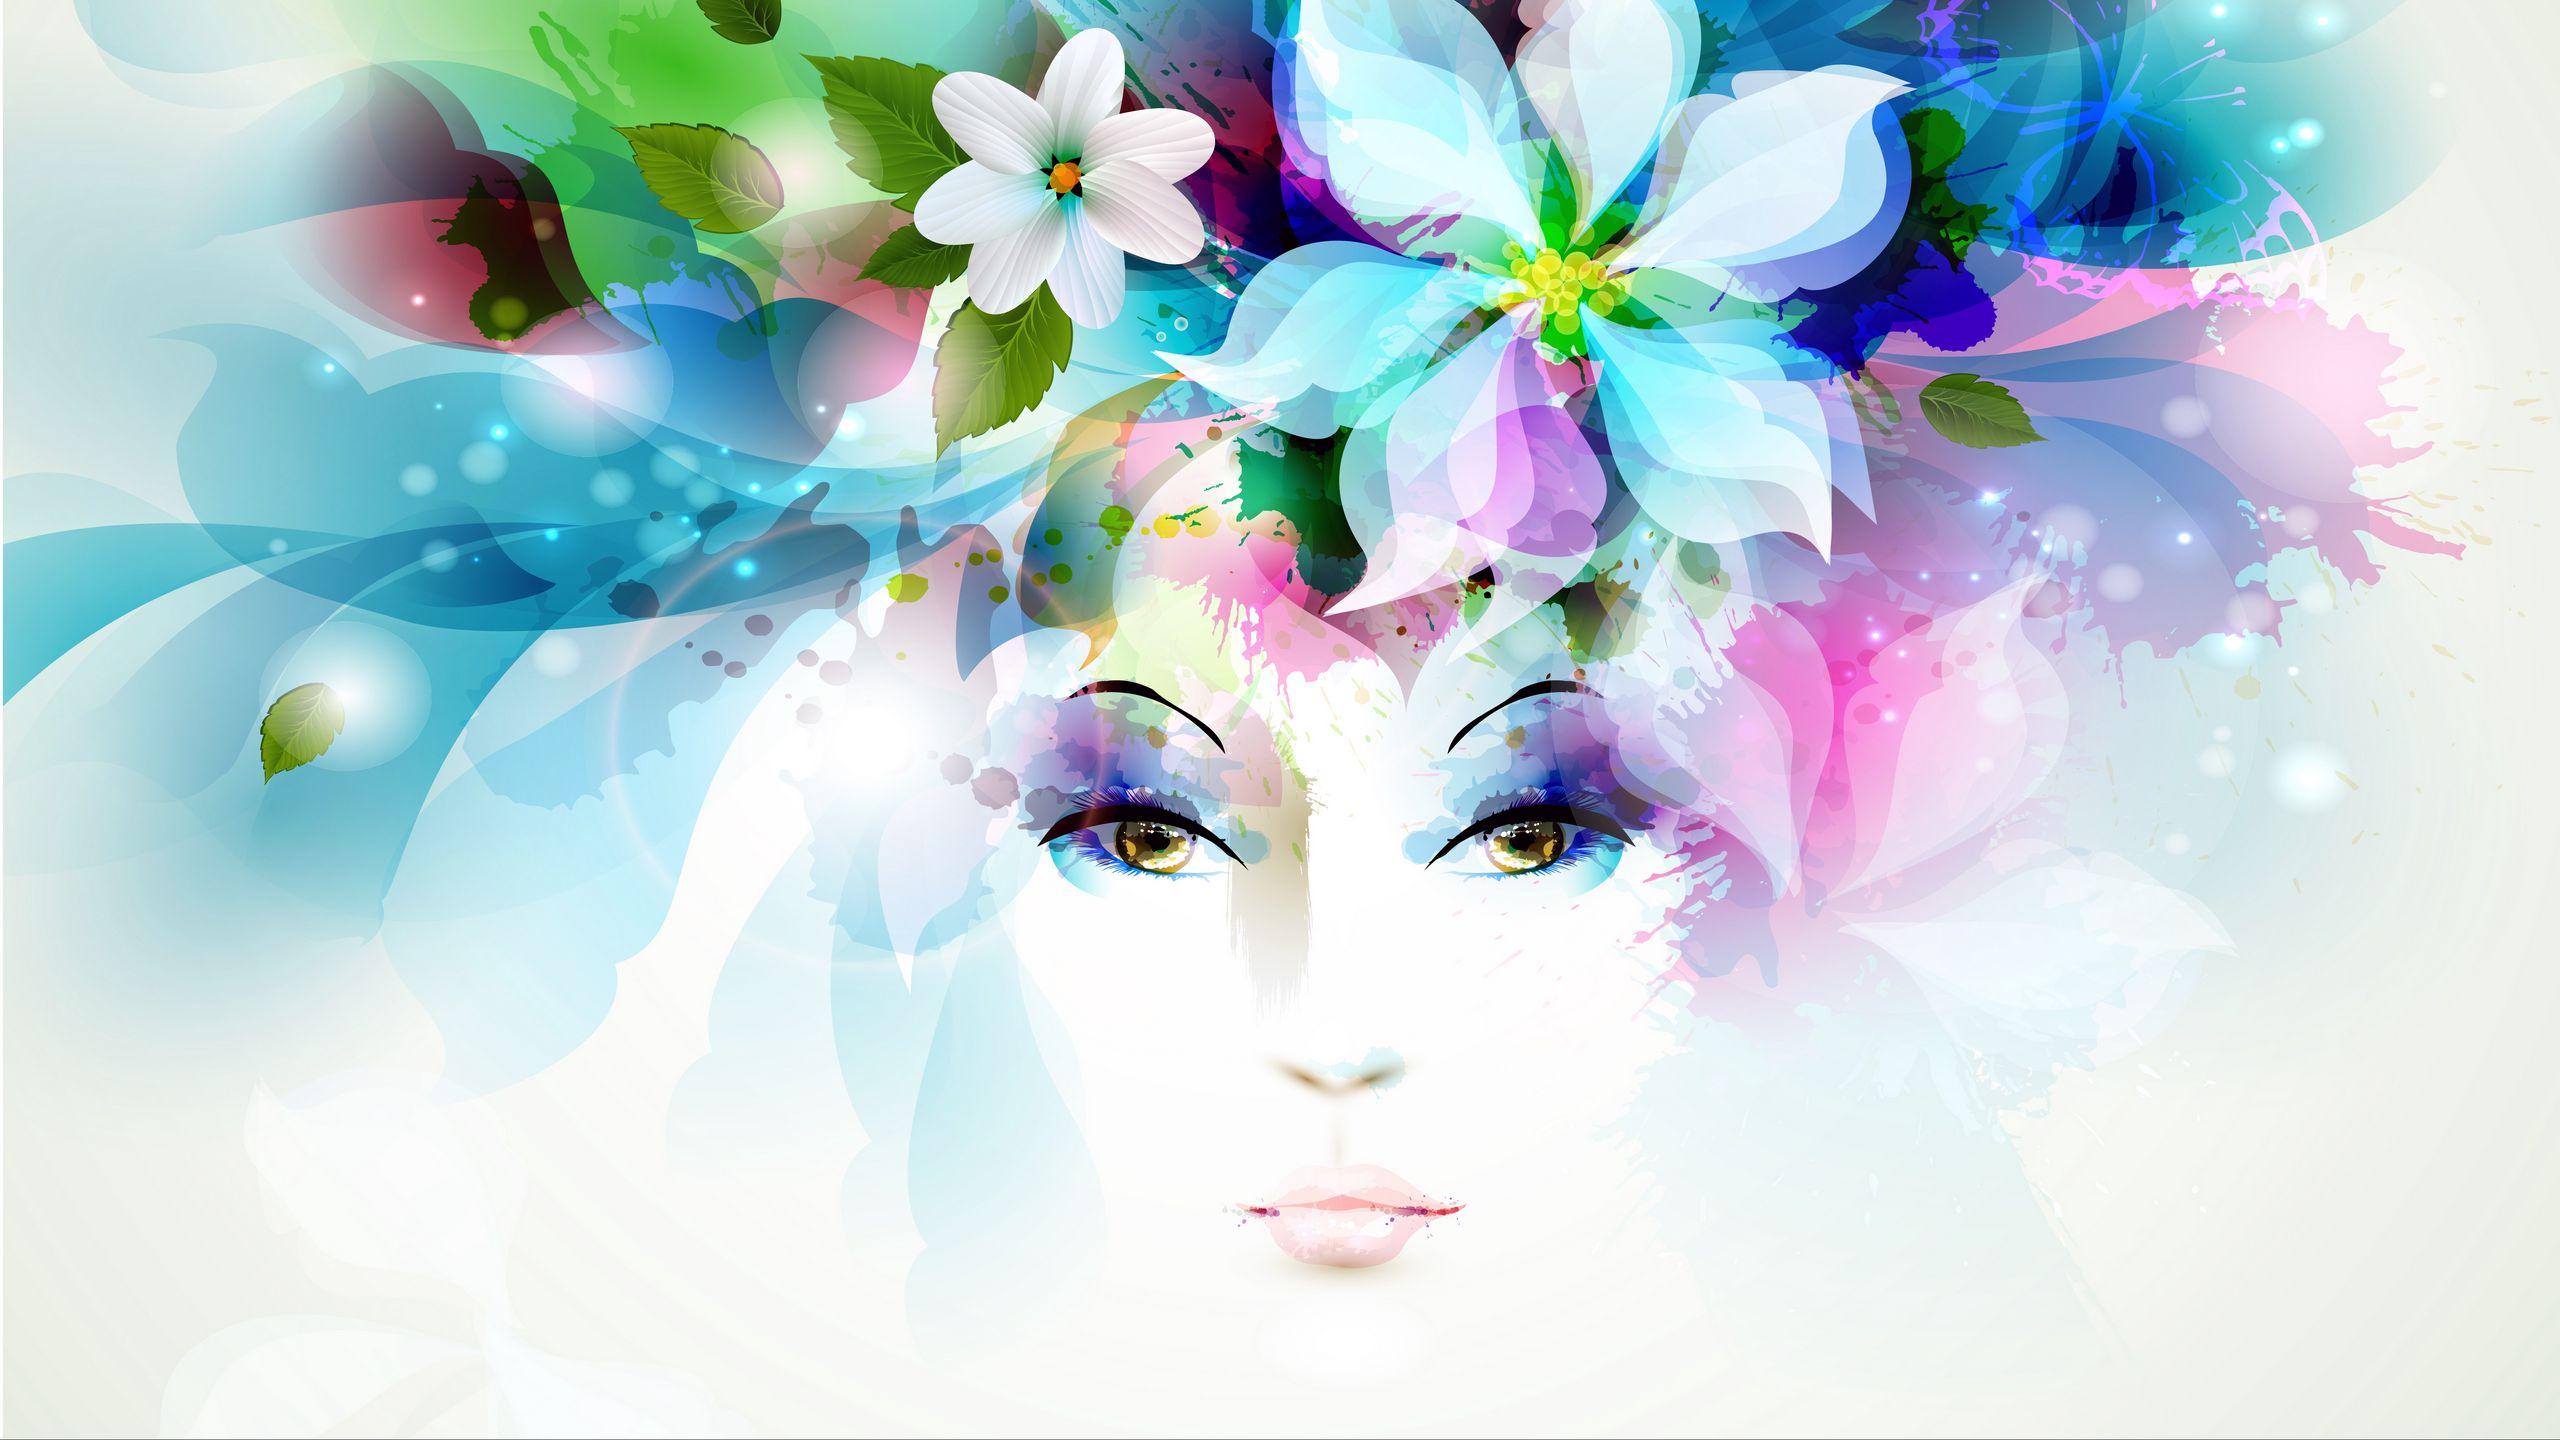 2560x1440 Wallpaper art, girl, eyes, flowers, petals, butterfly, leaves, spray